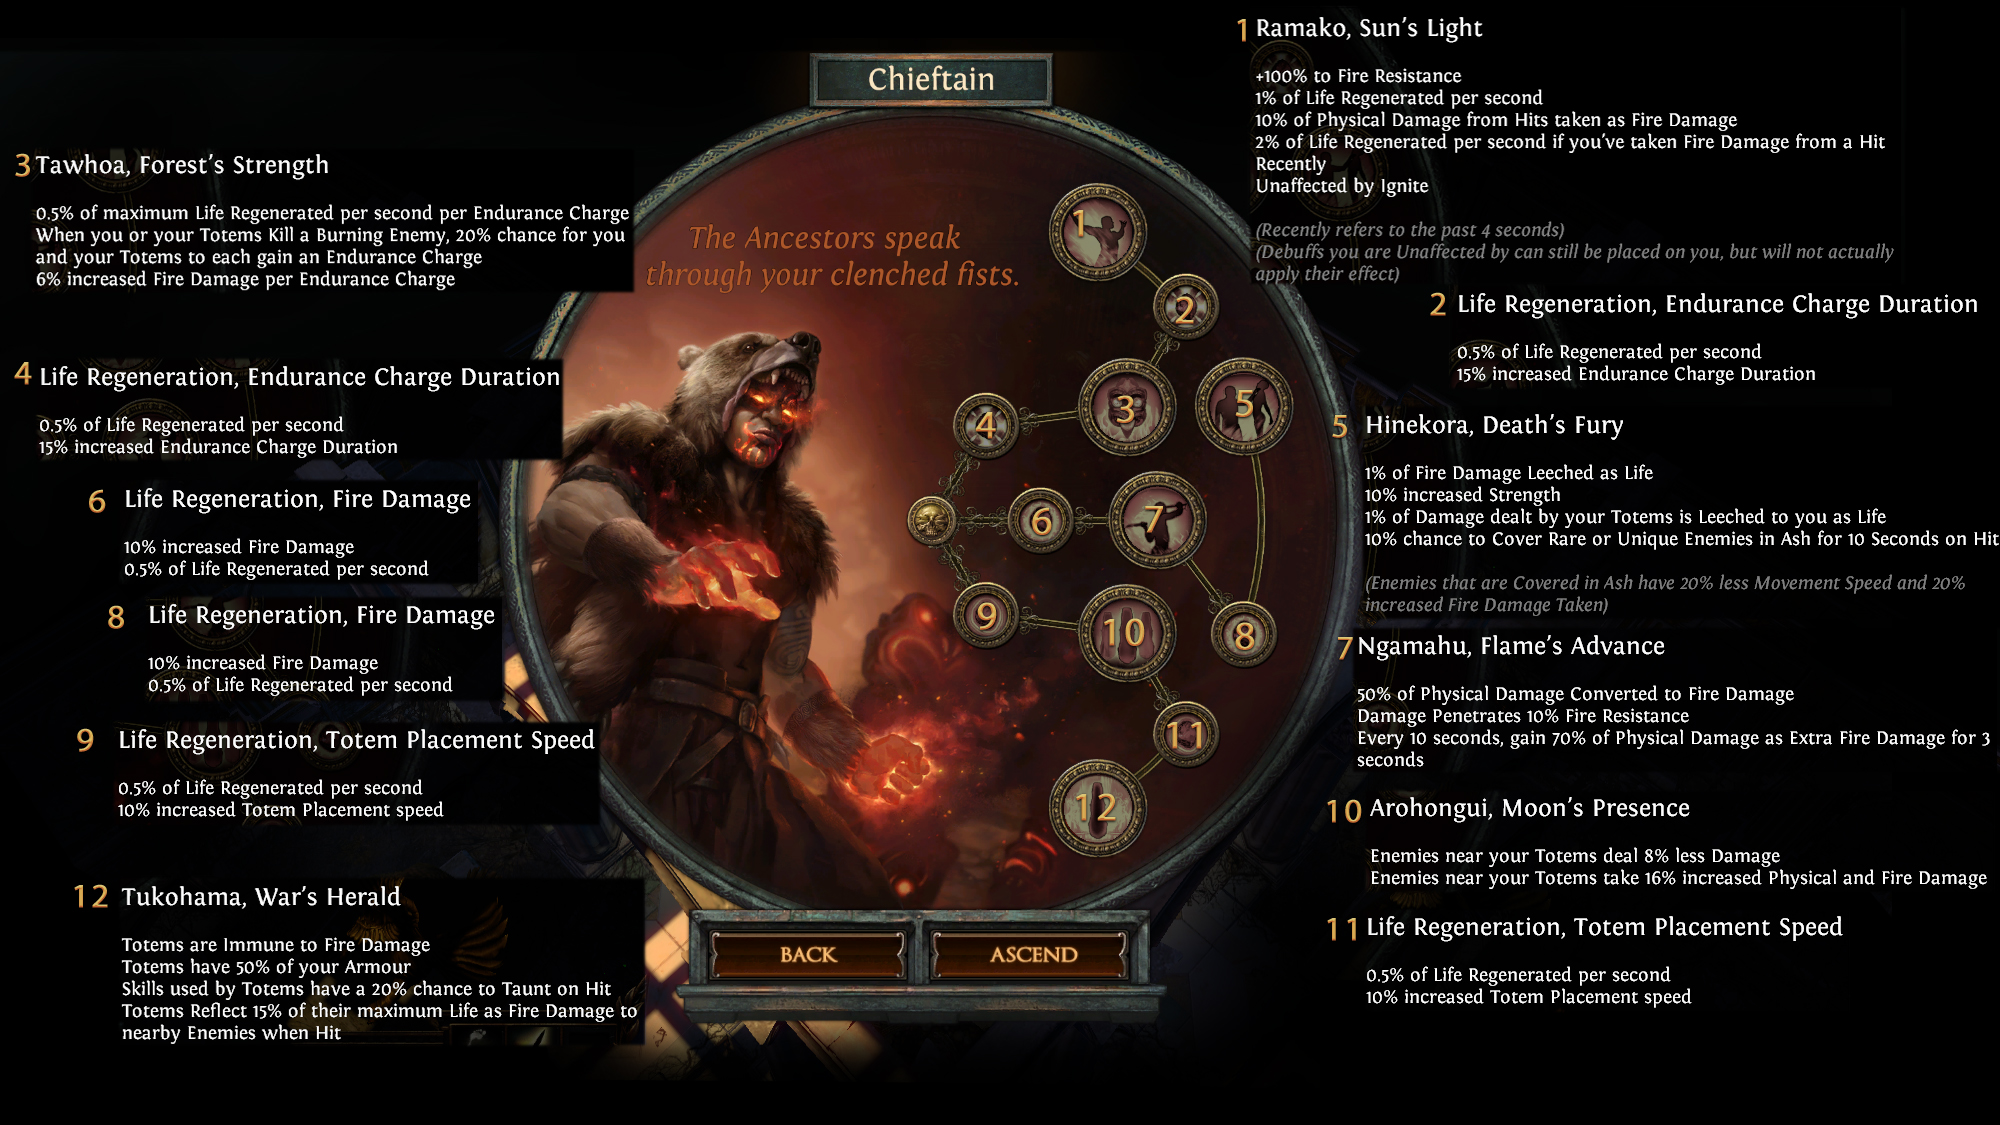 Forum - Marauder - [3 8] For Marauder - Ngamahu's Flame